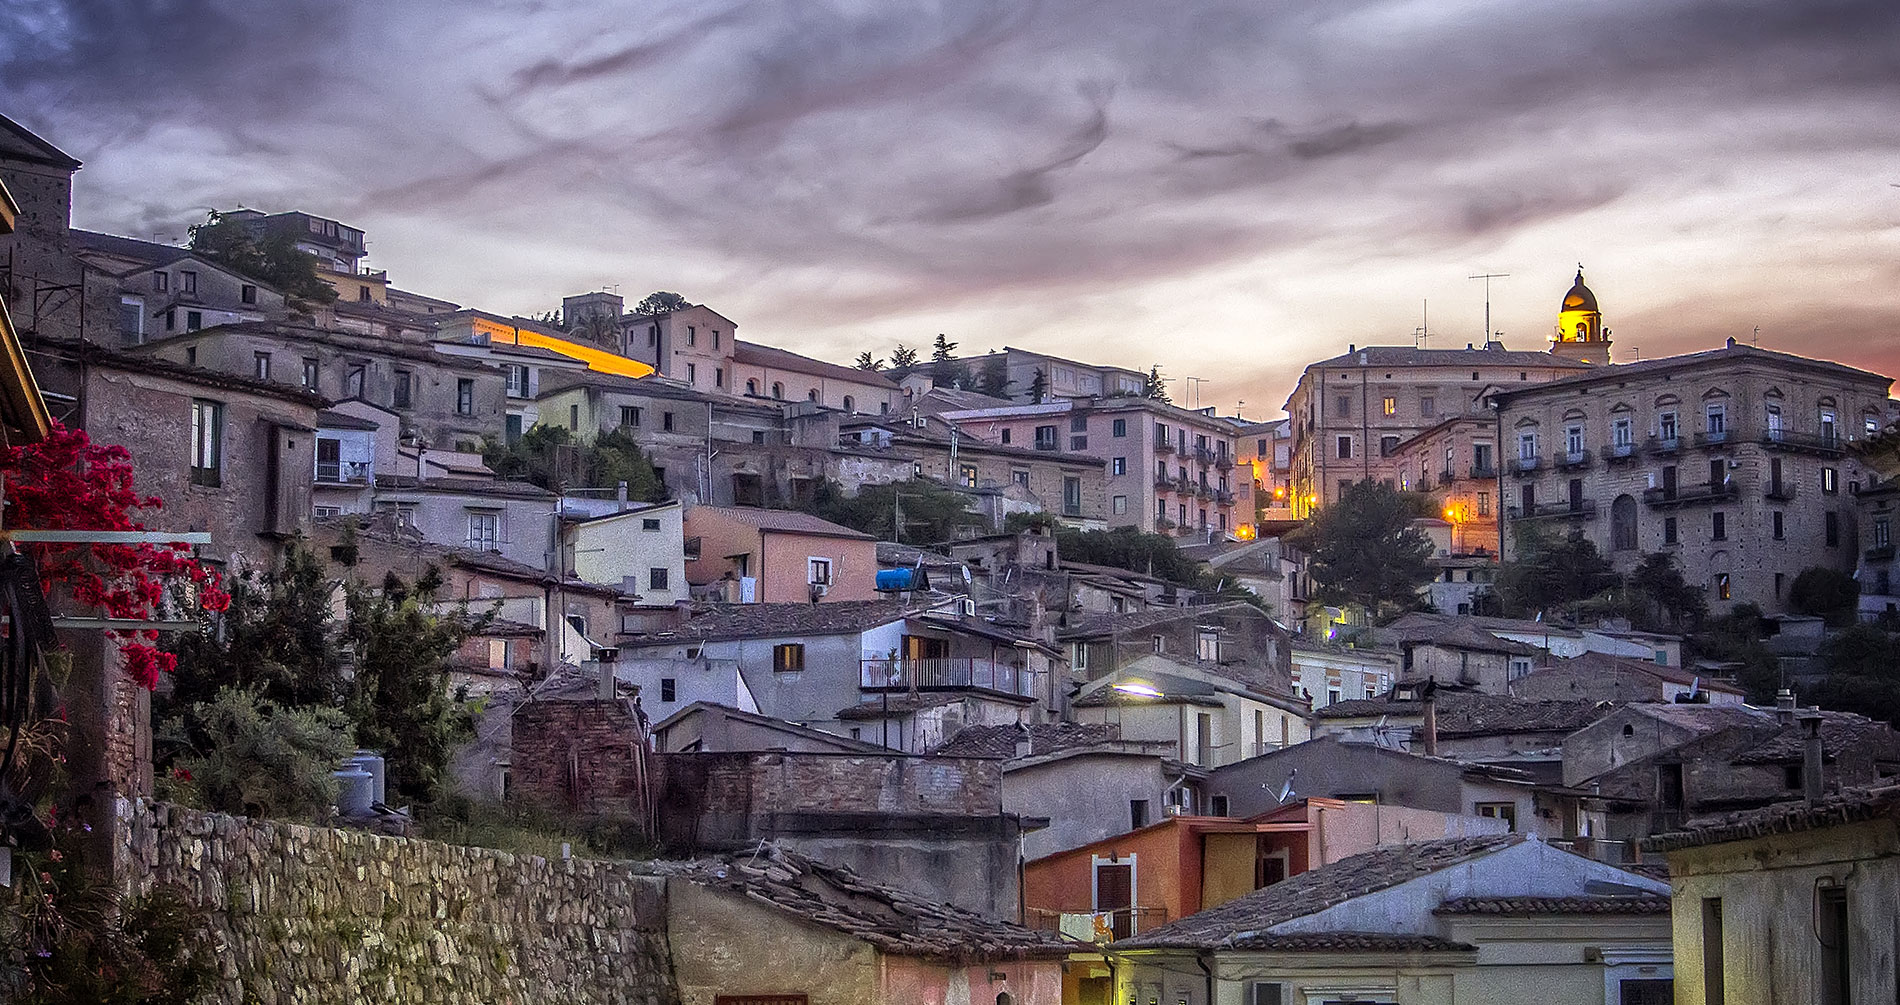 Rossano - centro storico